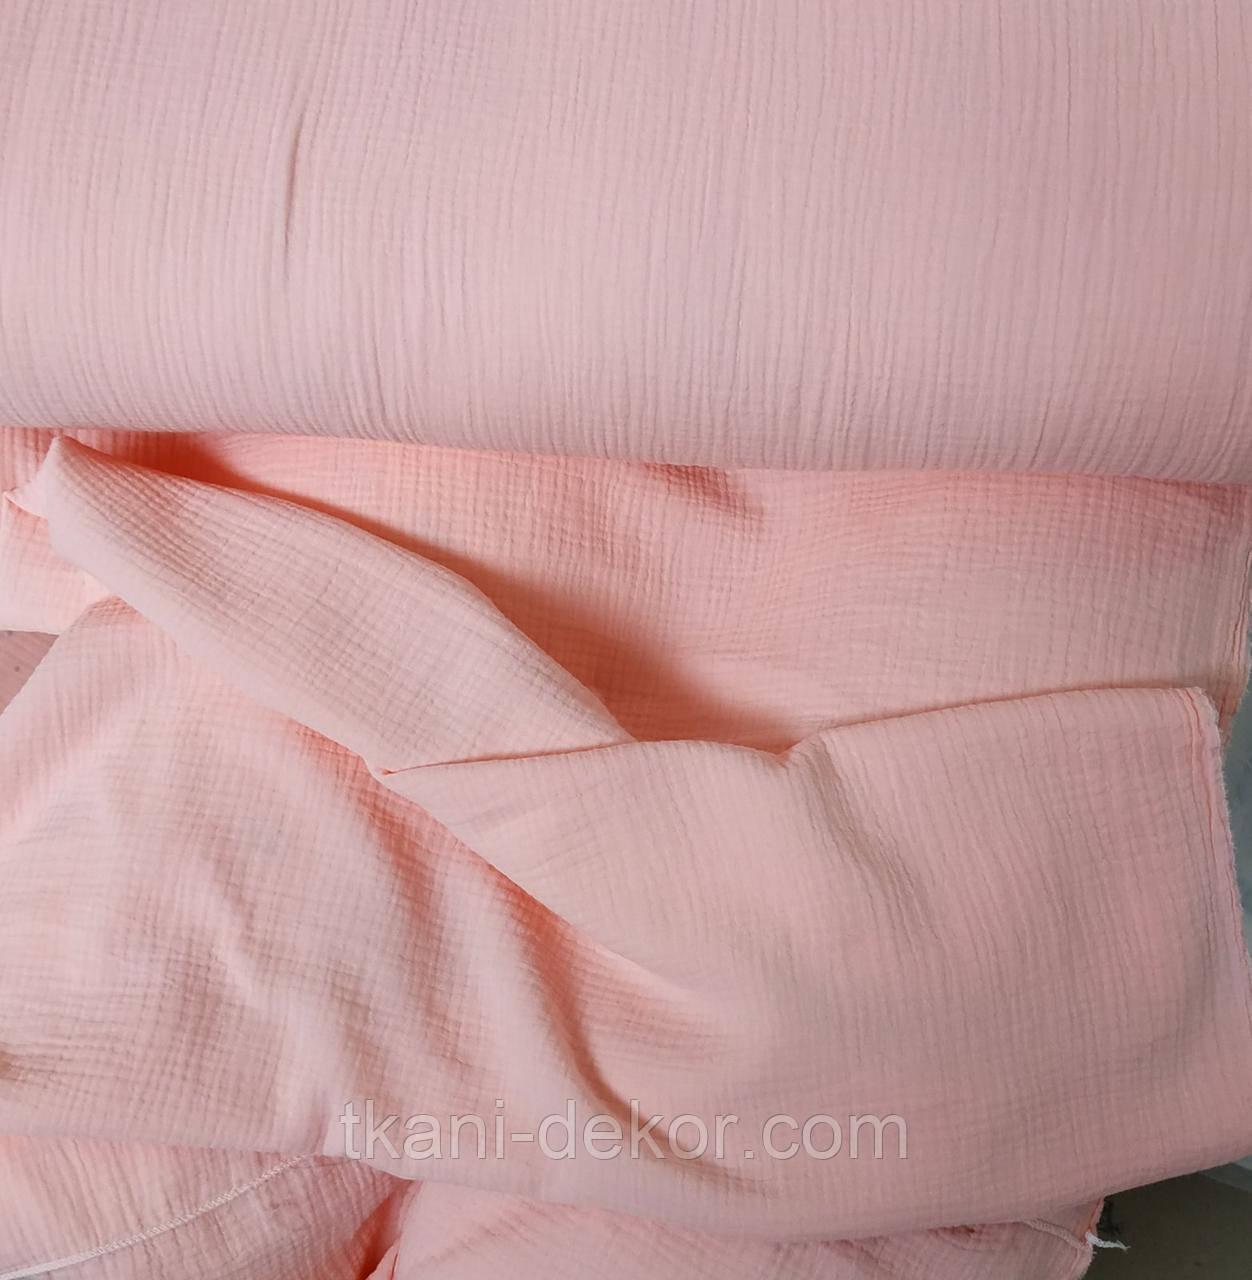 Муслин (хлопковая ткань) жатка розовый однотон (ширина 1,35 м) (60*135)